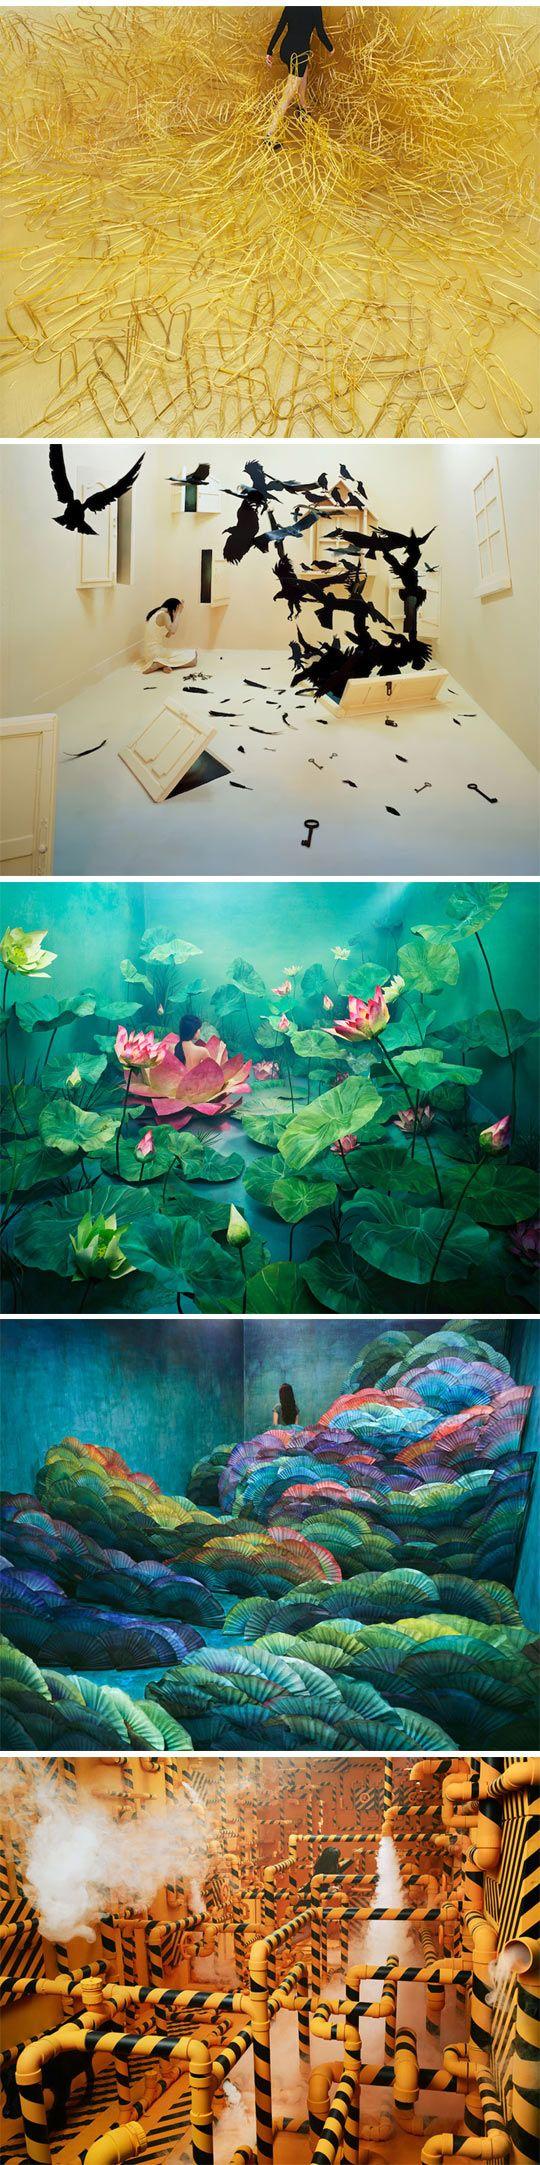 small studio transformed into beautiful dream worlds